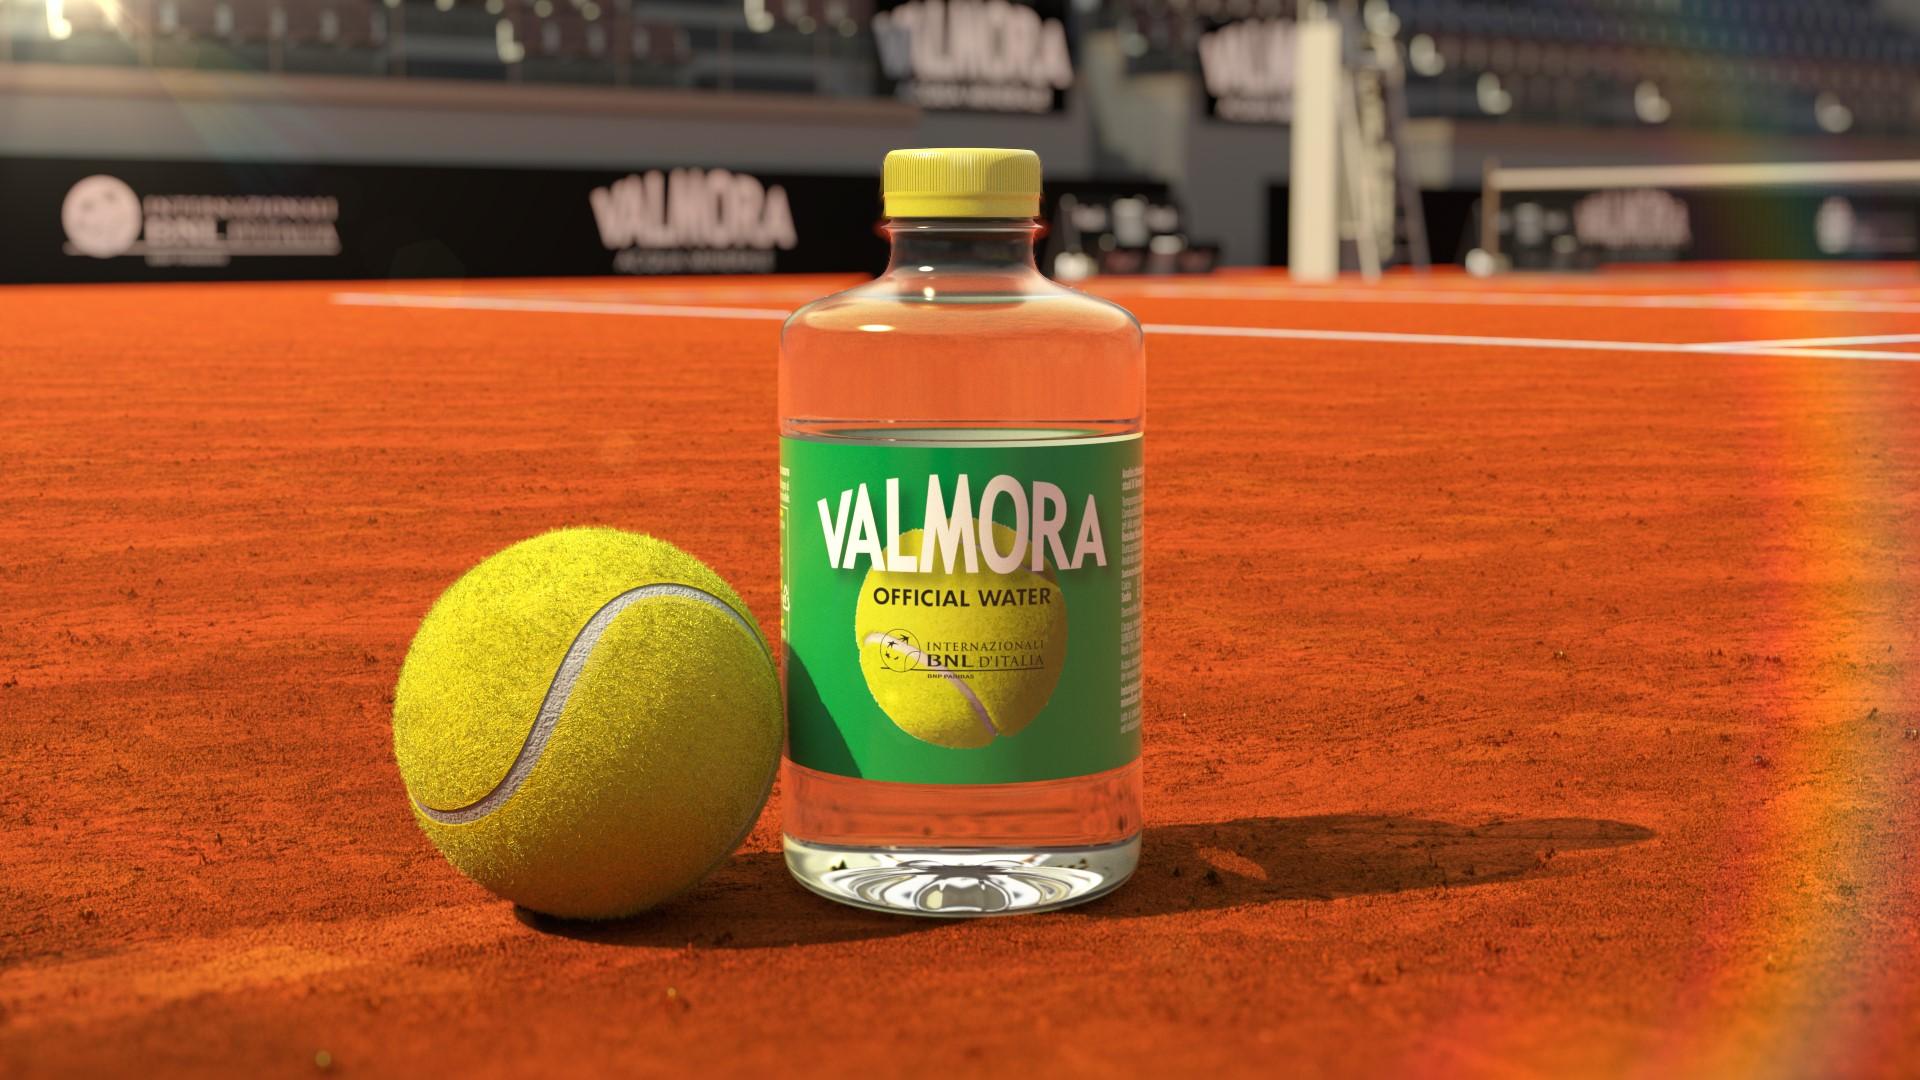 Acqua Valmora, sponsor ufficiale Internazionali di Tennis BNL 2021